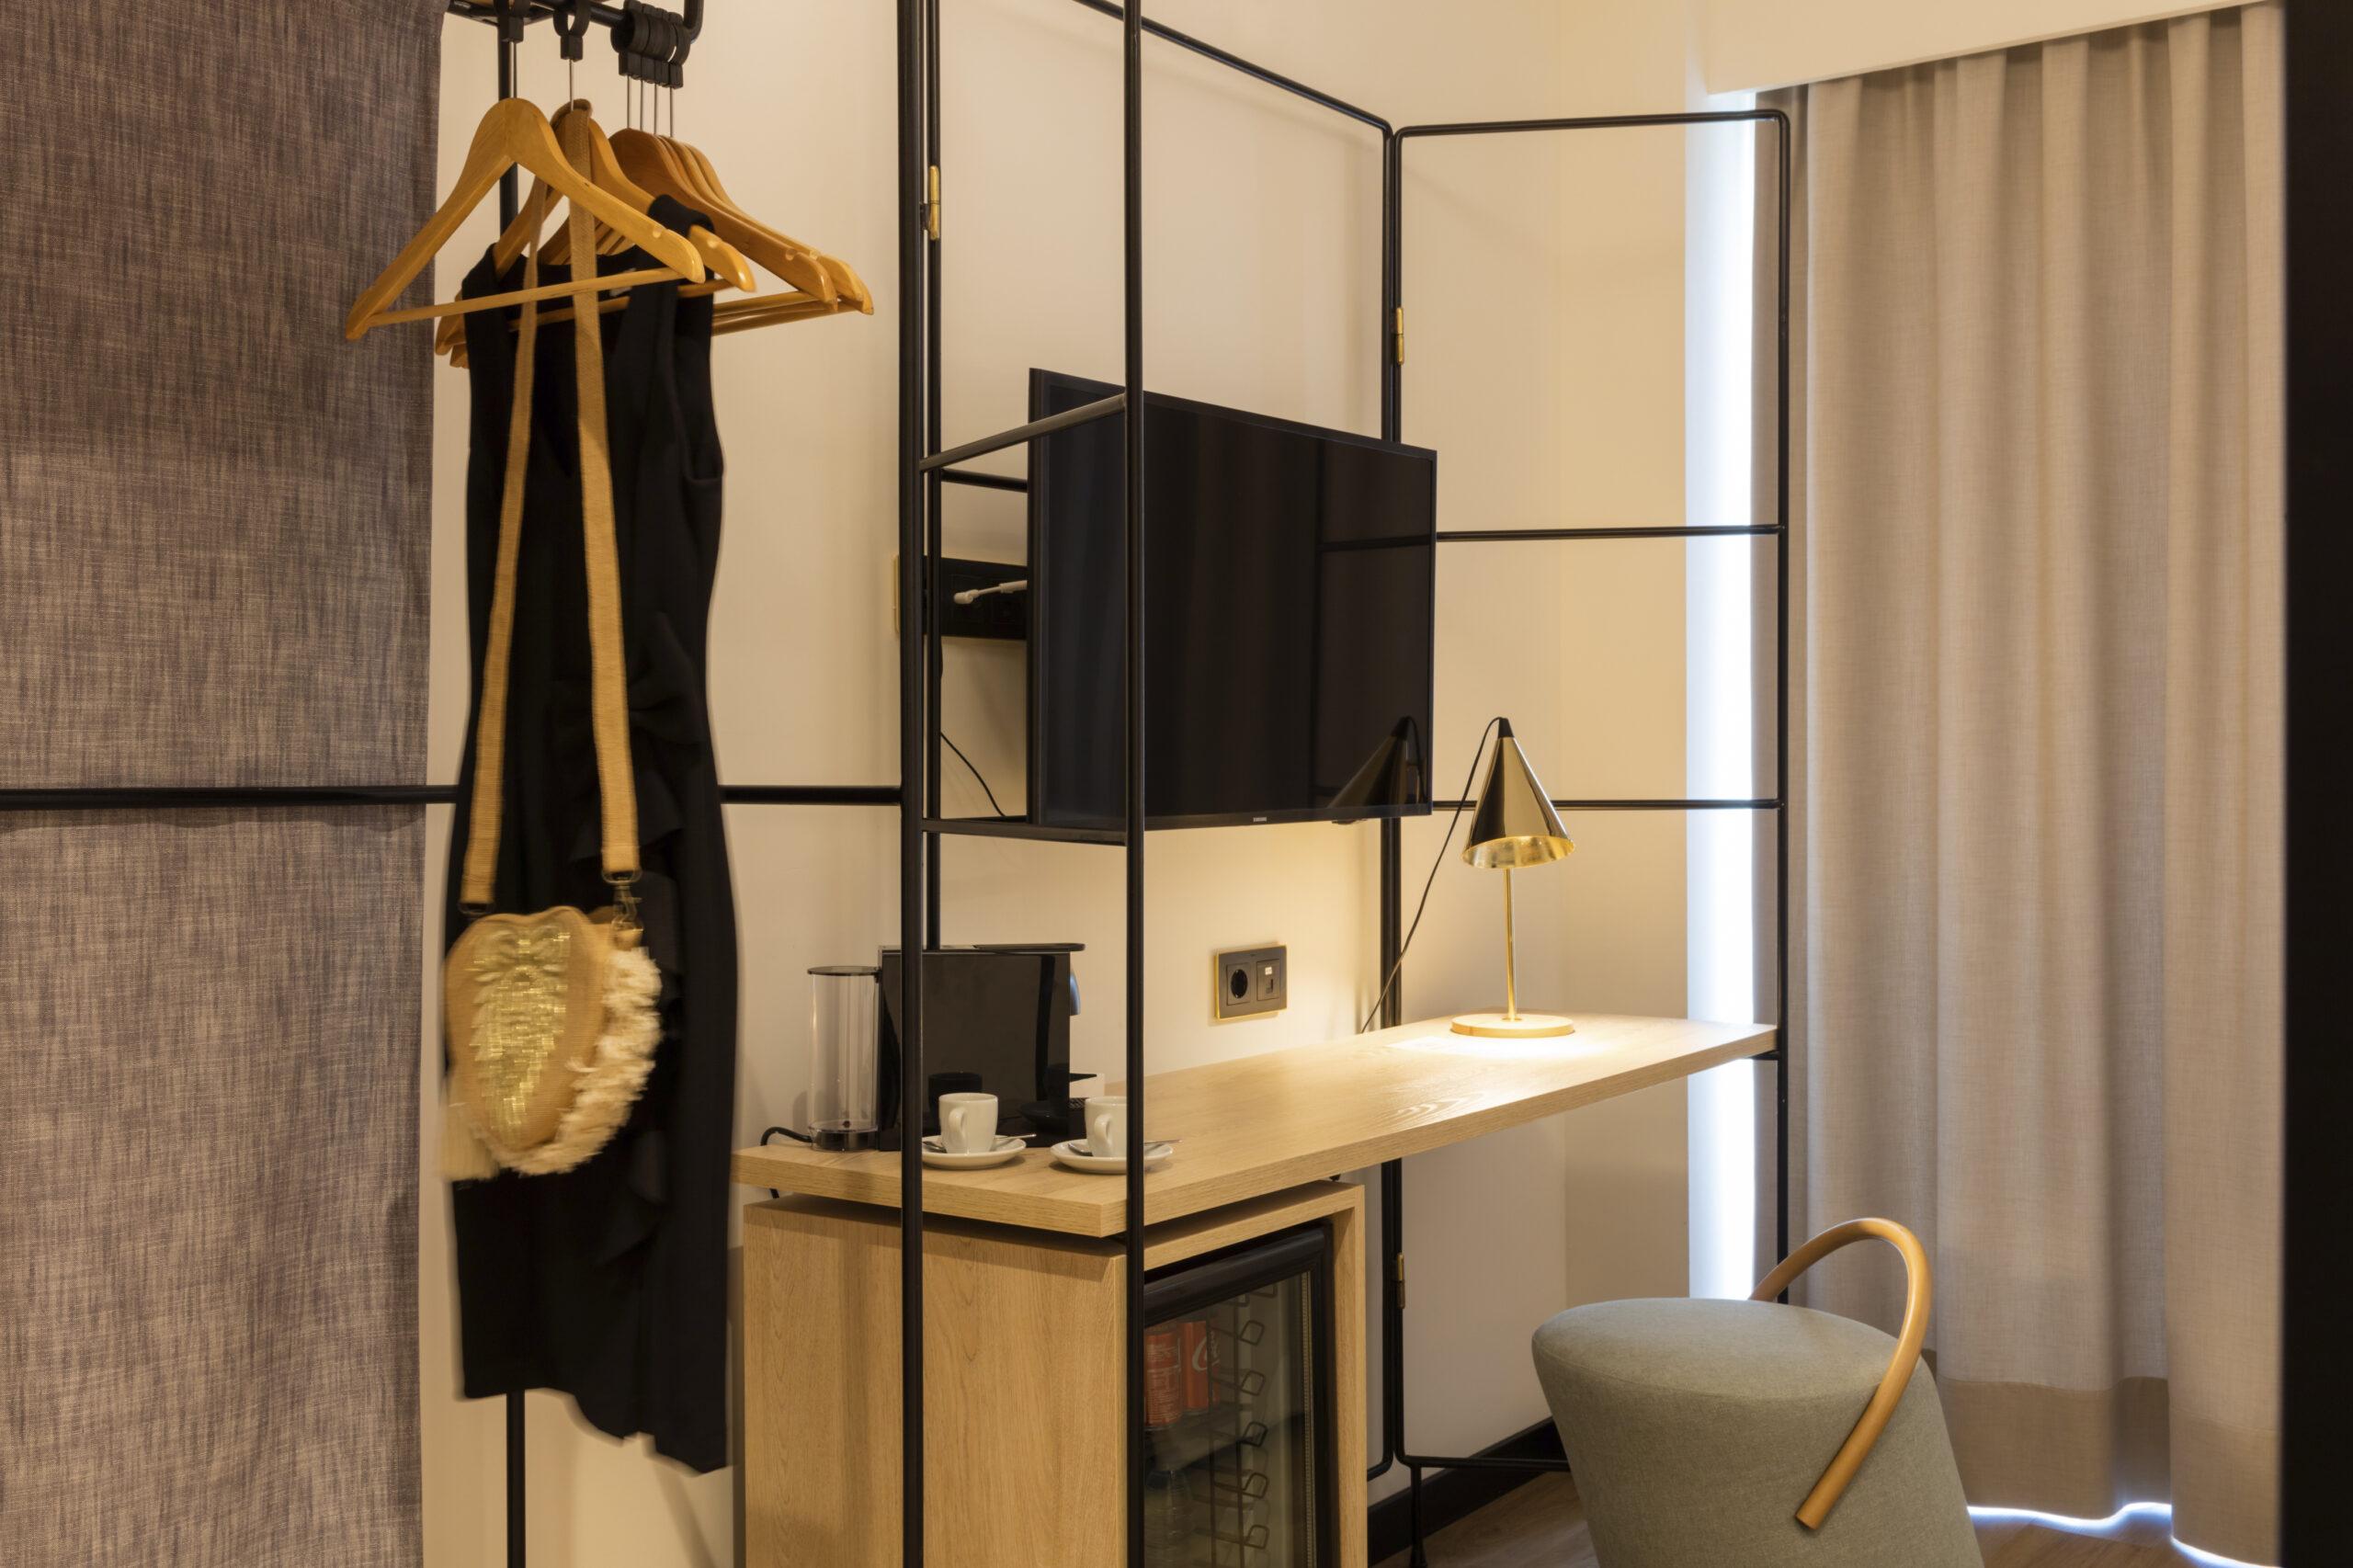 Ars Magna Bleisure Hotel - Double Standard